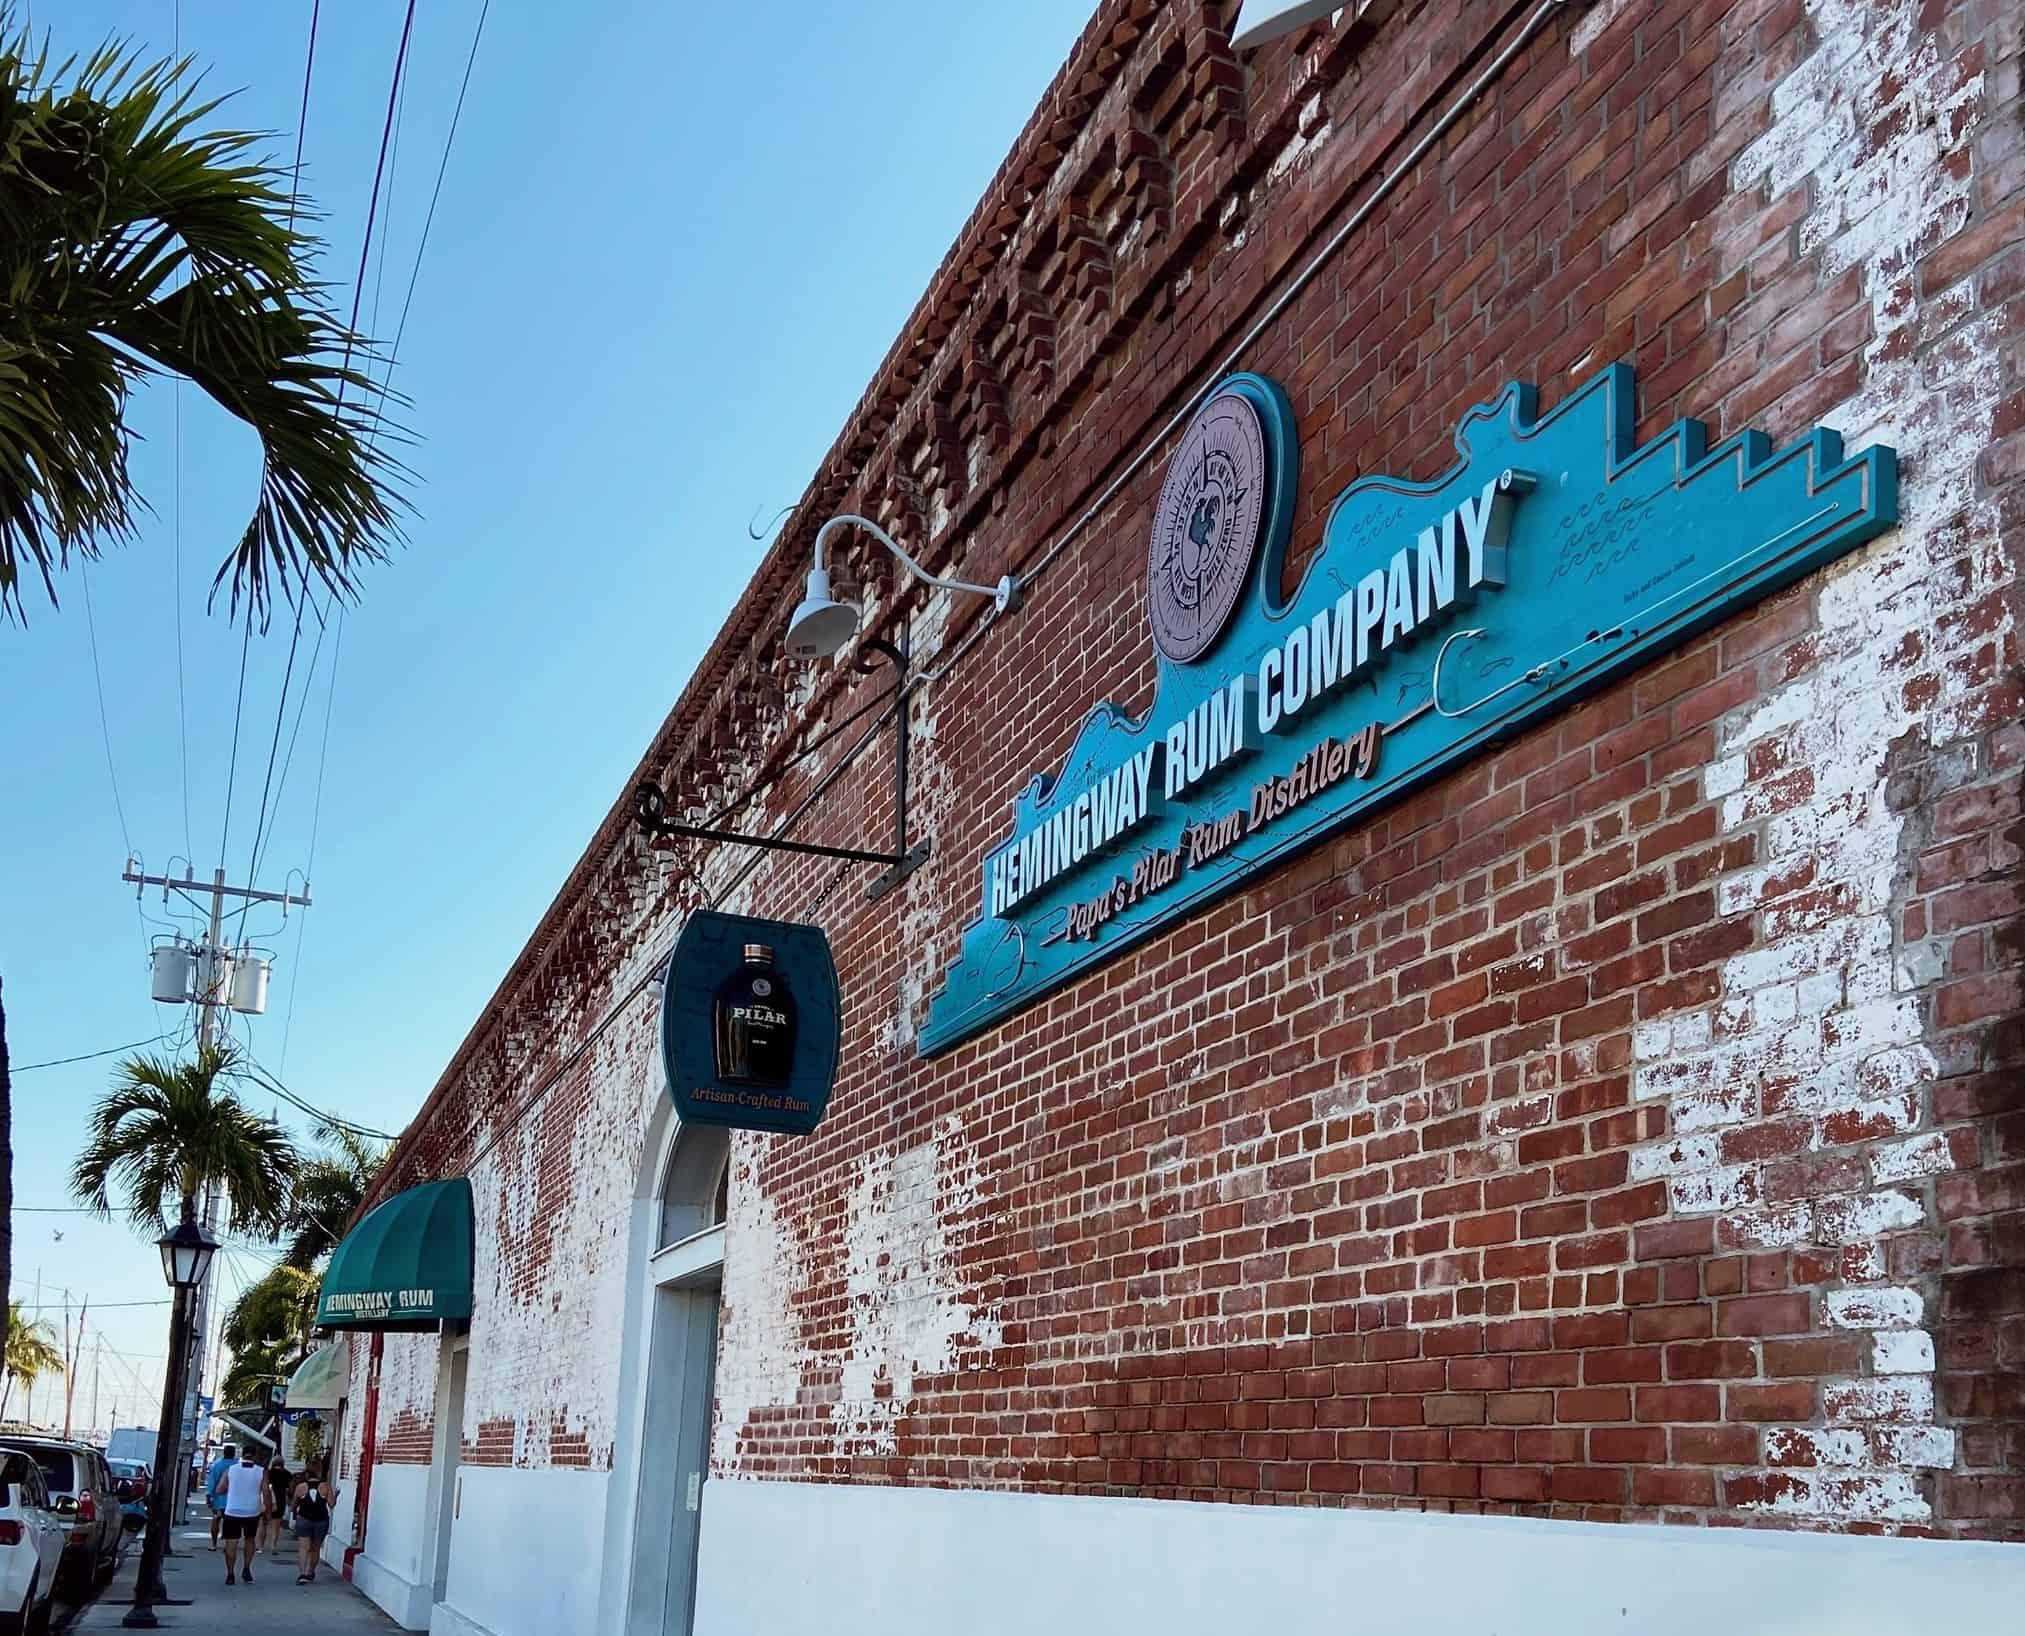 hemingway rum company florida keys